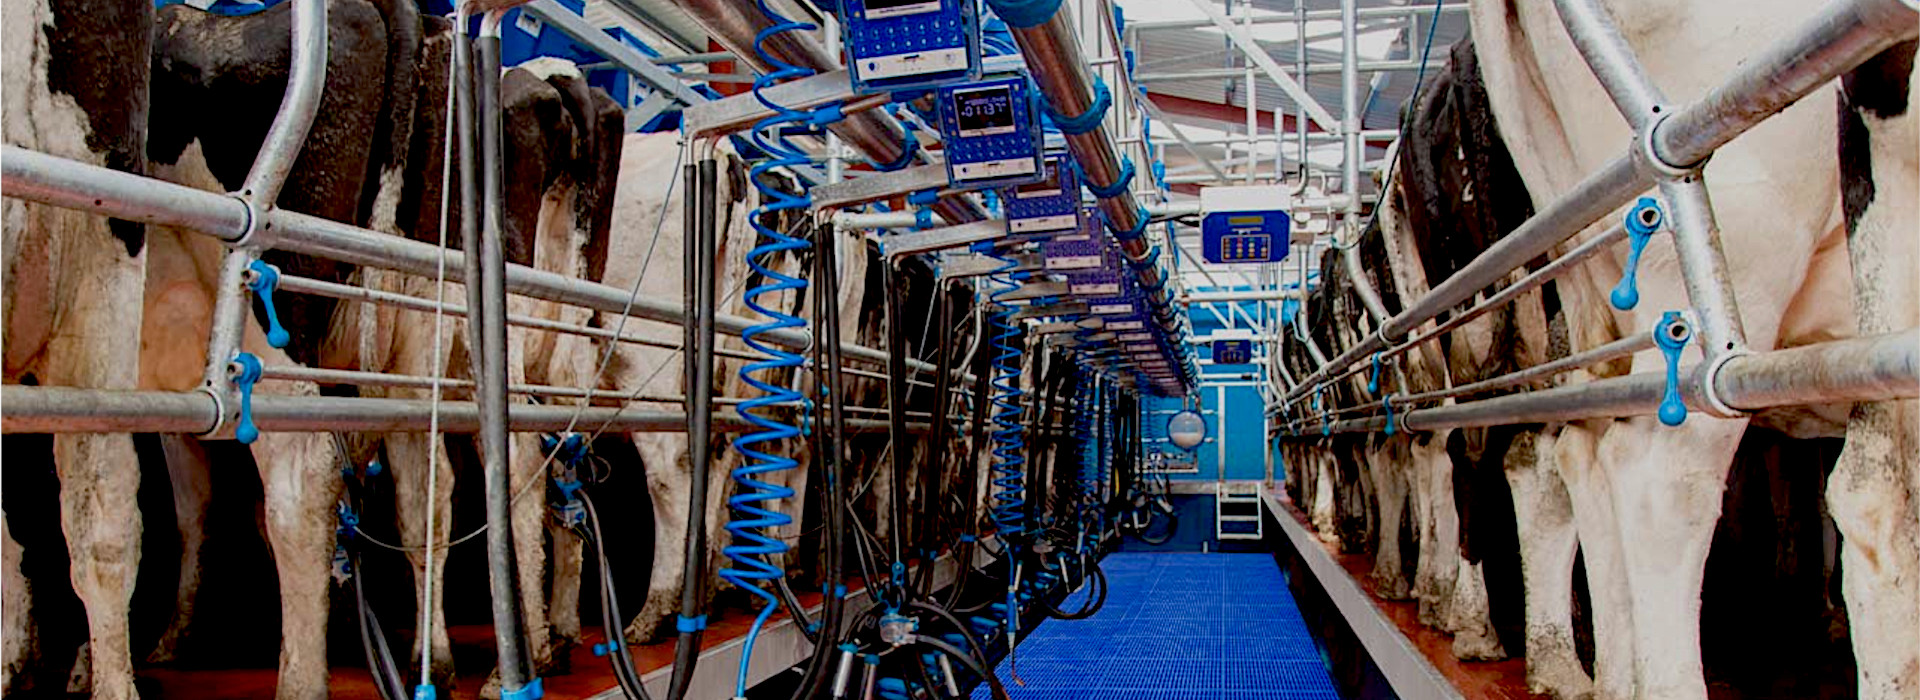 Dairymaster swing-over3